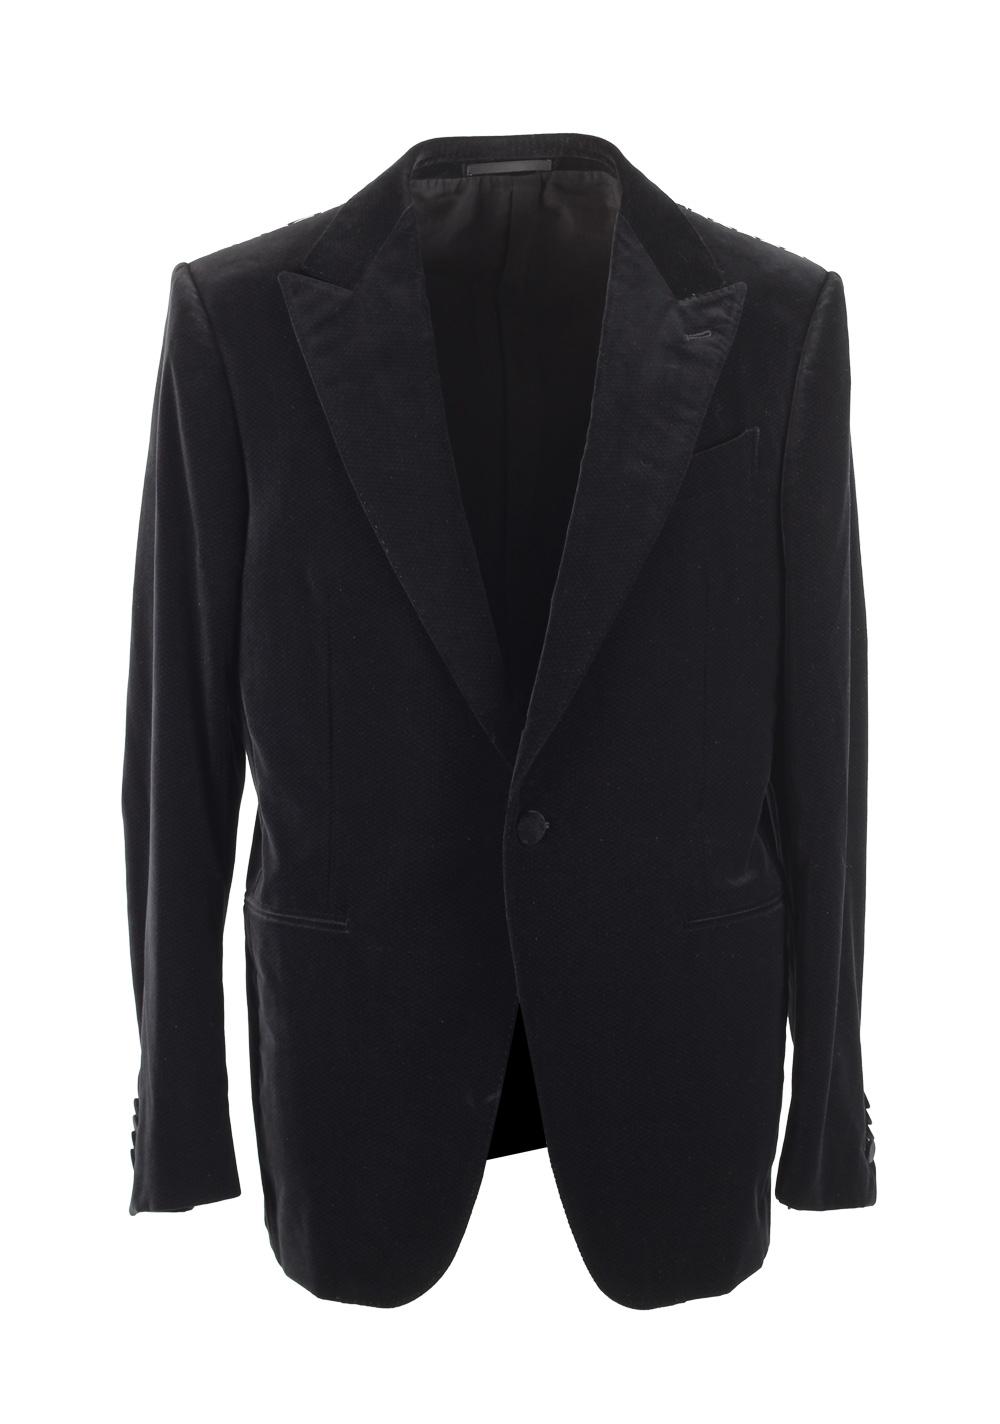 Ermenegildo Zegna Mila Black Dinner Jacket Size 52 / 42R U.S. | Costume Limité